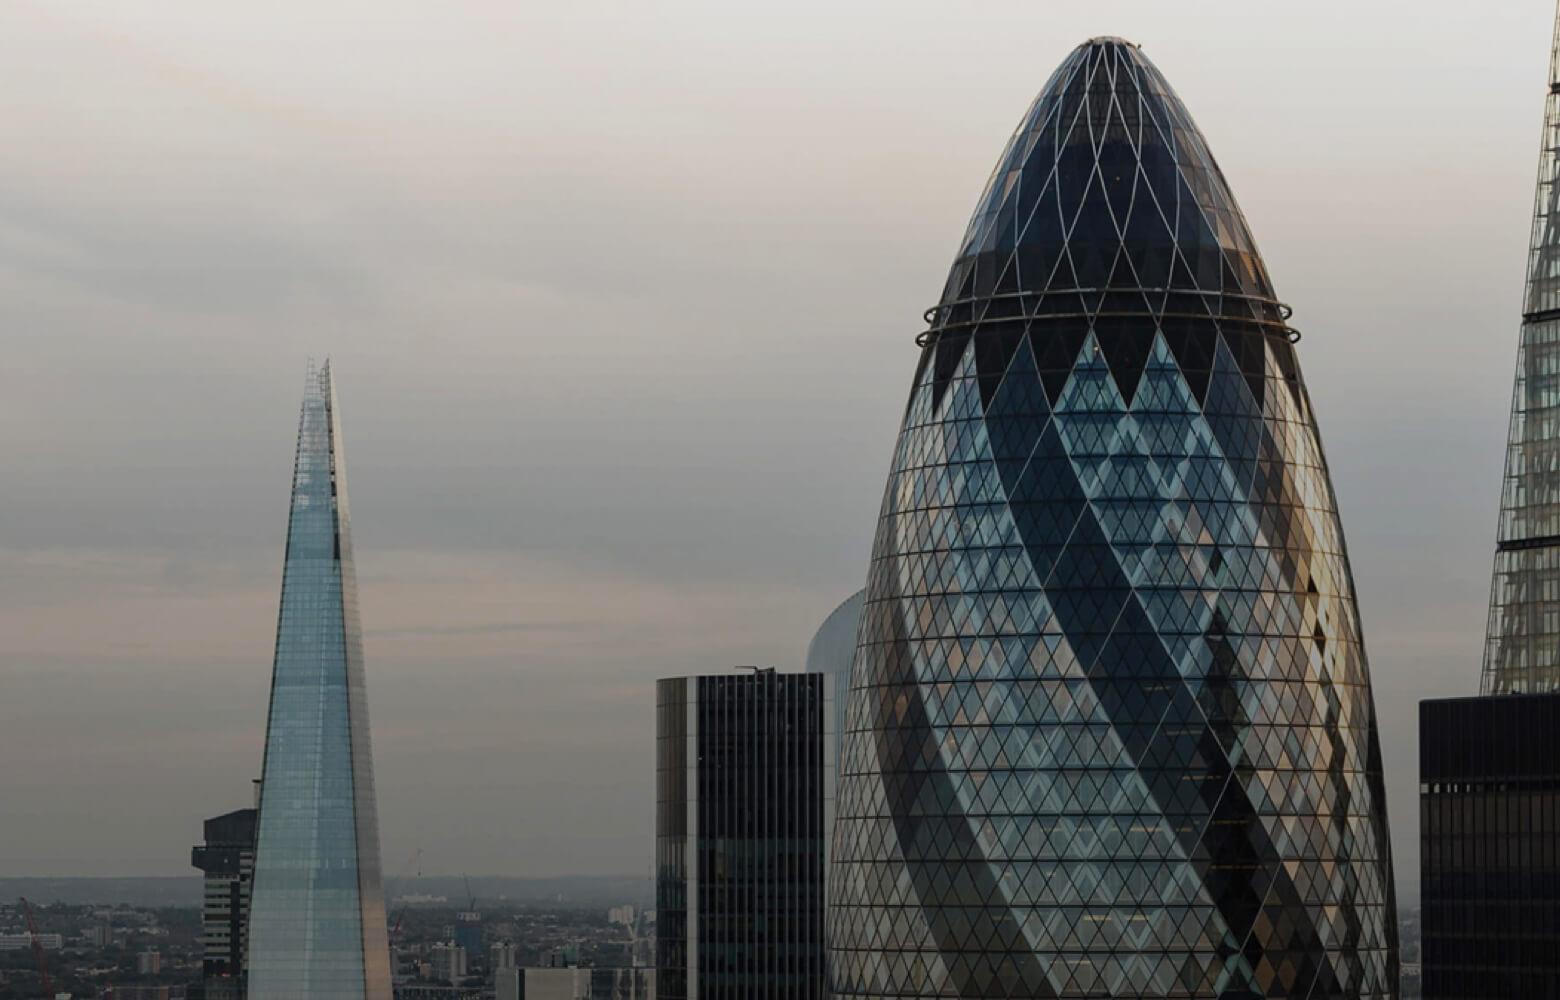 London skyline featuring top of gherkin.